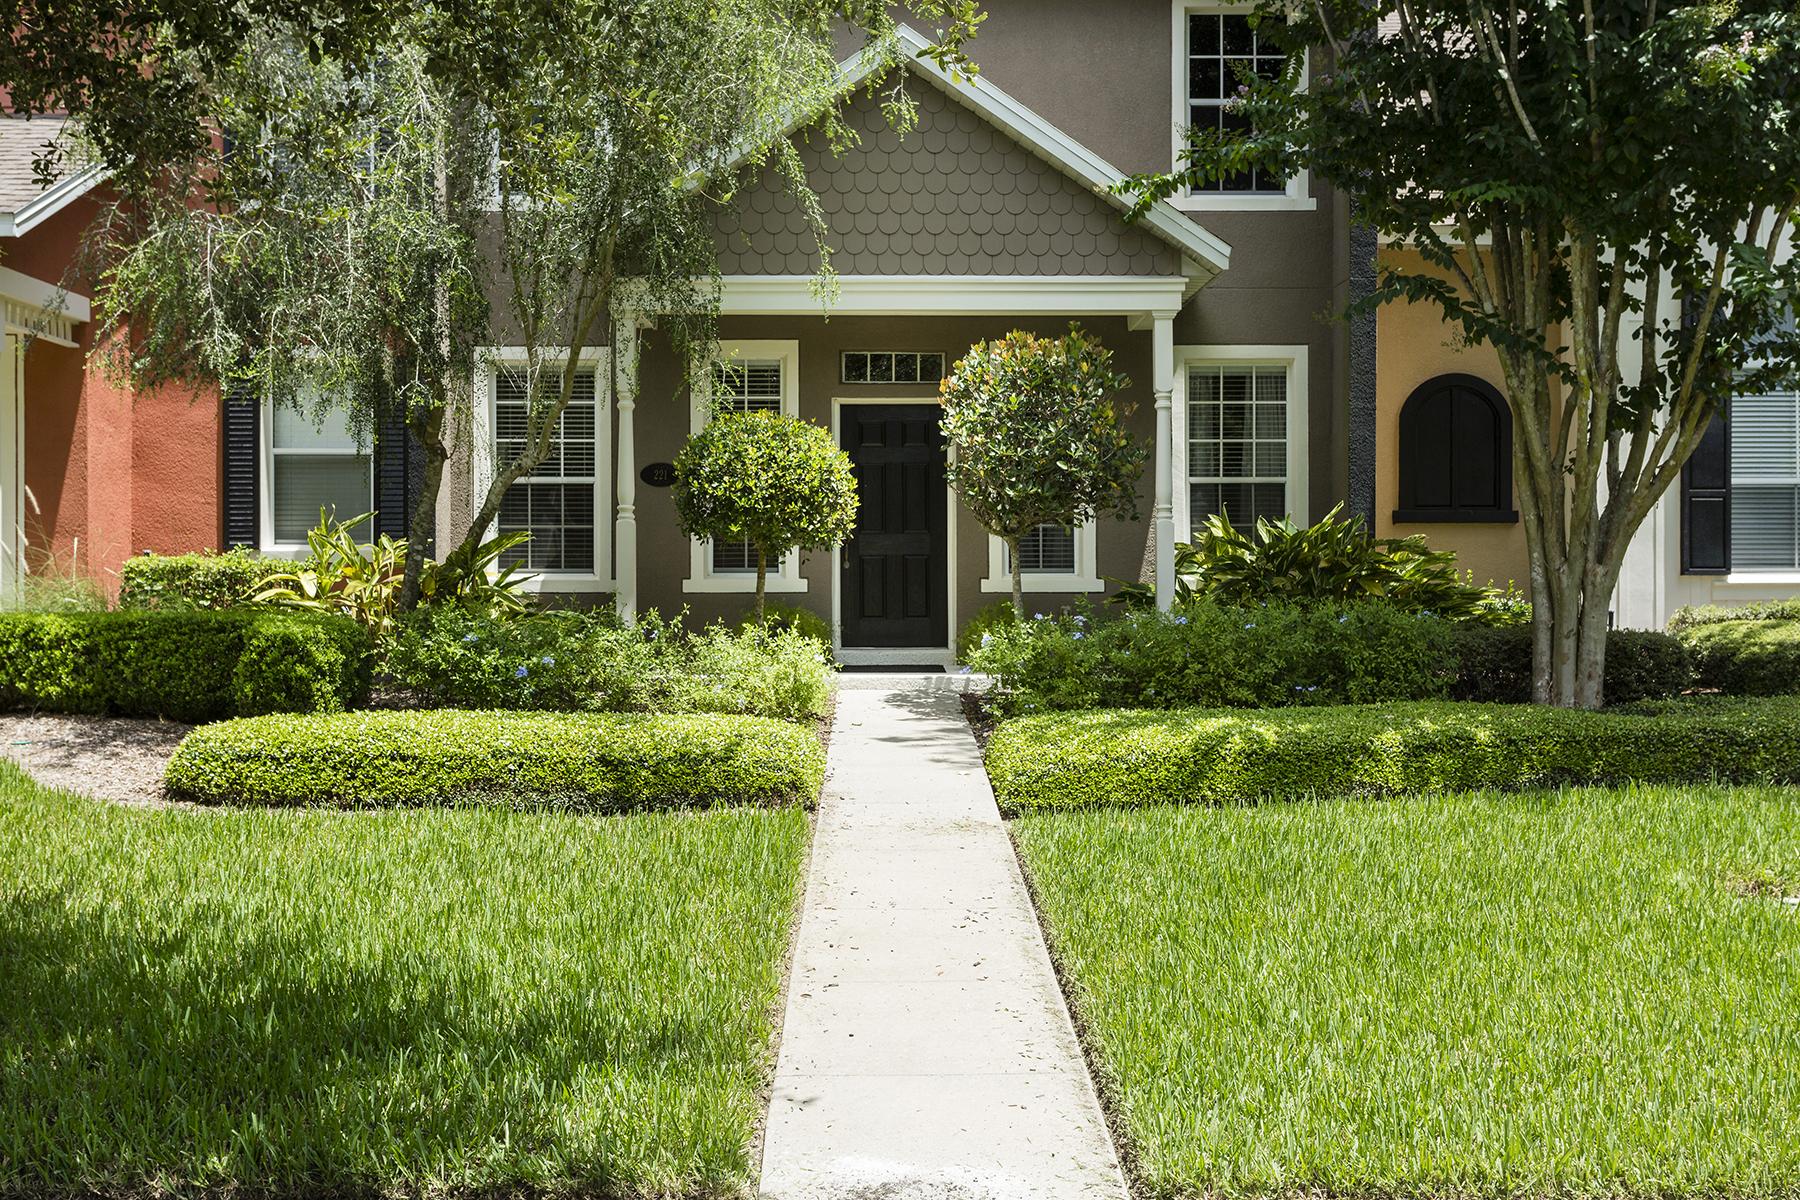 Konak için Satış at 221 Endicott Way , Deland, FL 32724 221 Endicott Way Deland, Florida, 32724 Amerika Birleşik Devletleri